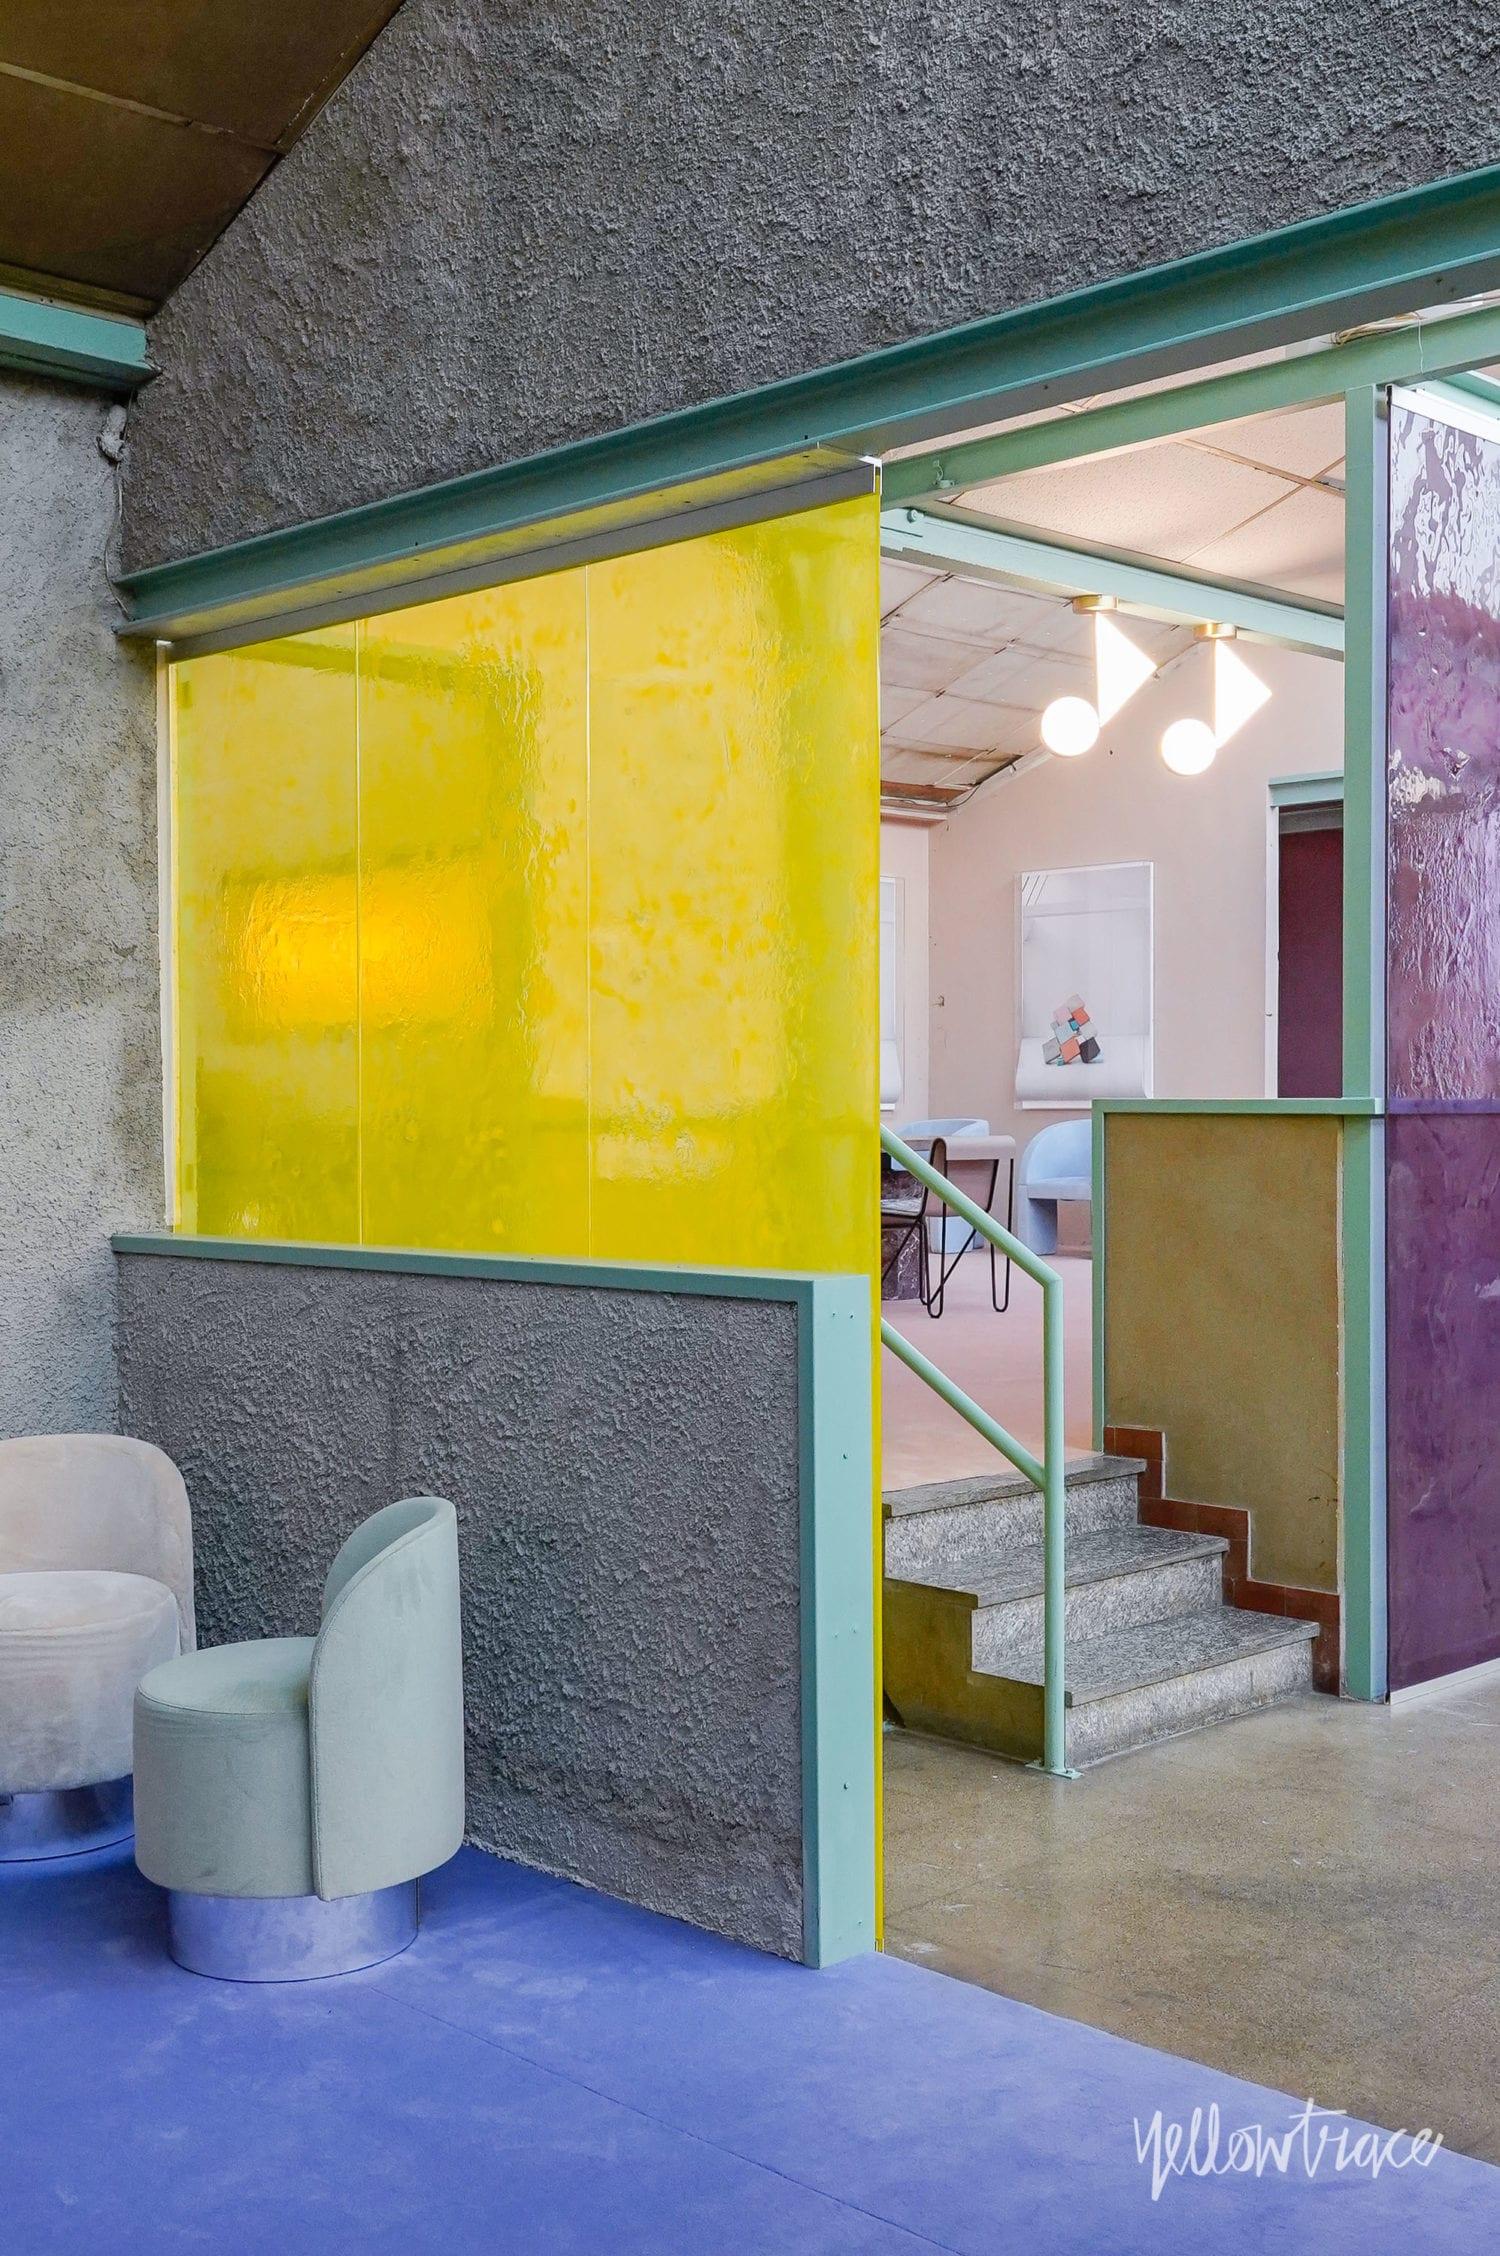 Les Arcanistes Studiopepe At Milan Design Week 2019 Photo Nick Hughes Yellowtrace 23